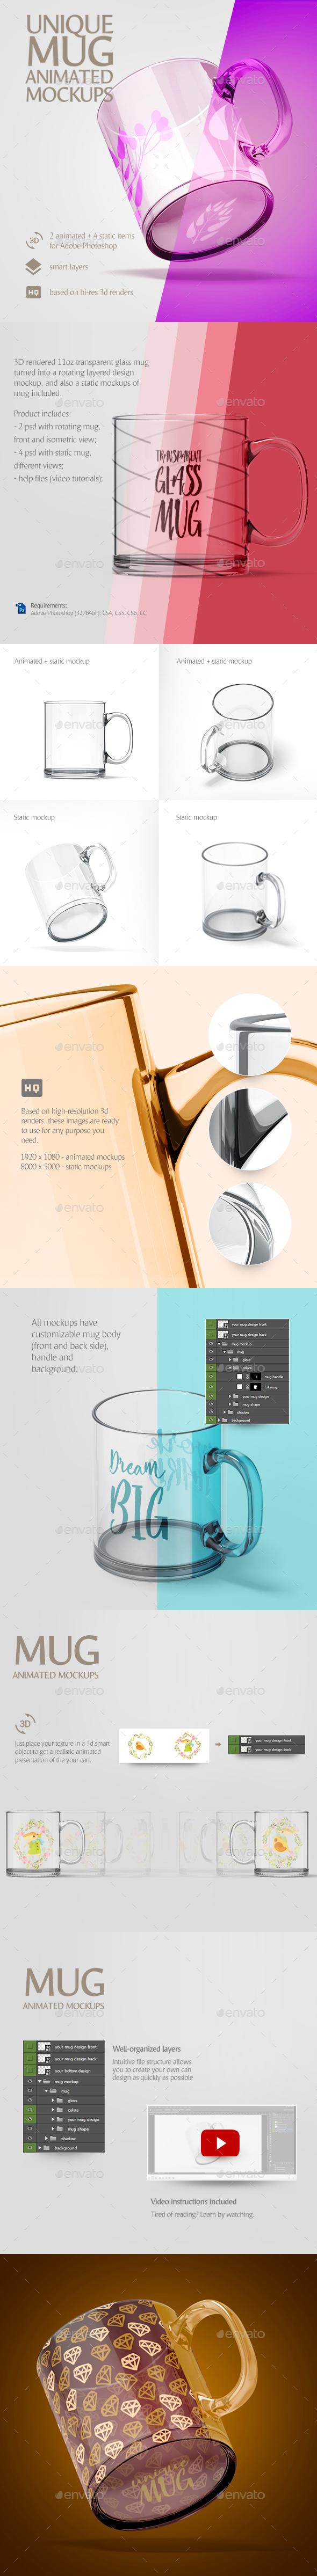 Glass Mug Animated Mockup - Stationery Print